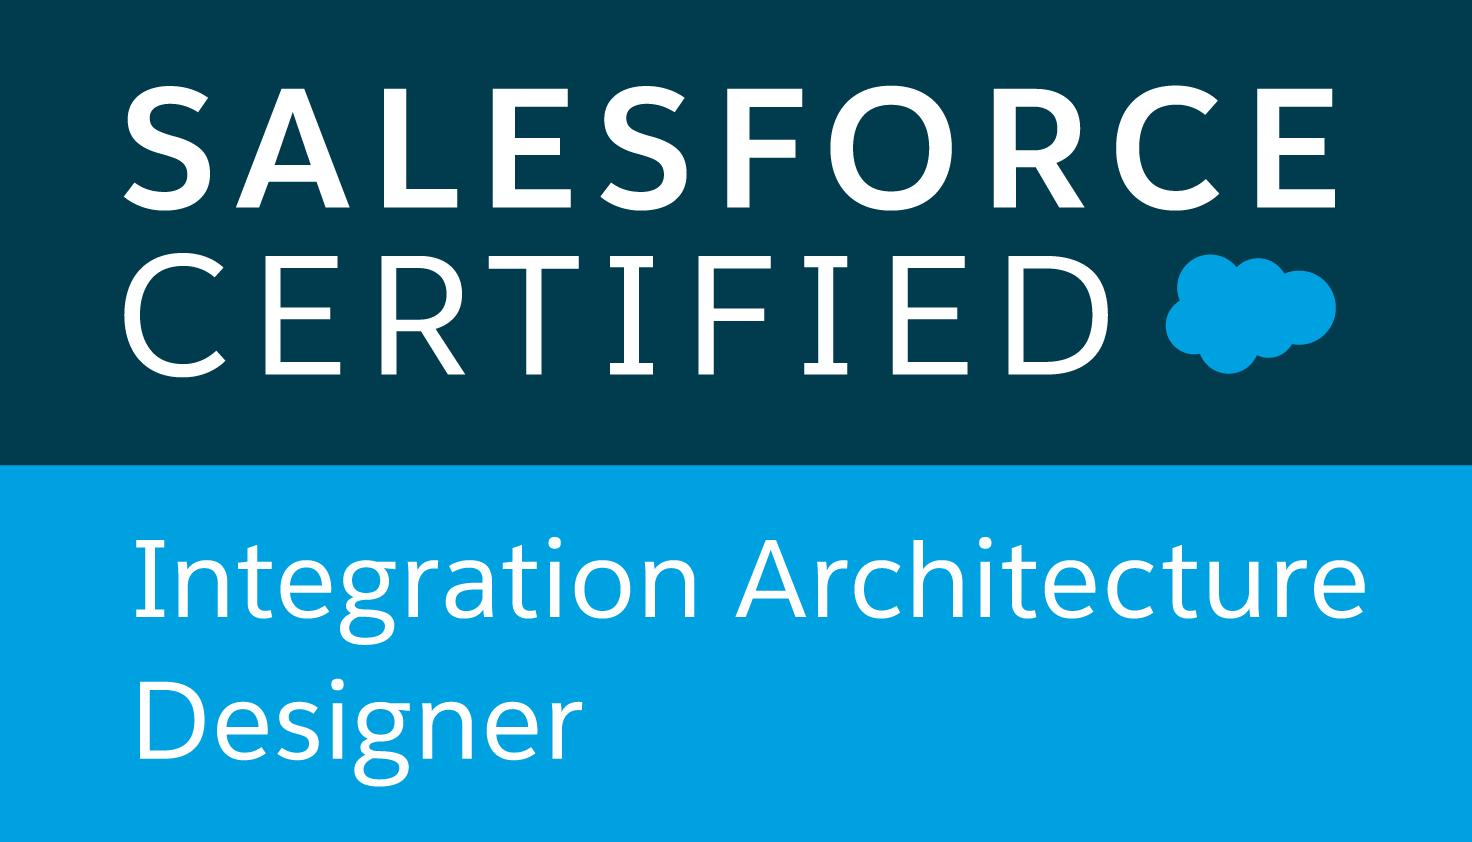 Integration Architecture Designer